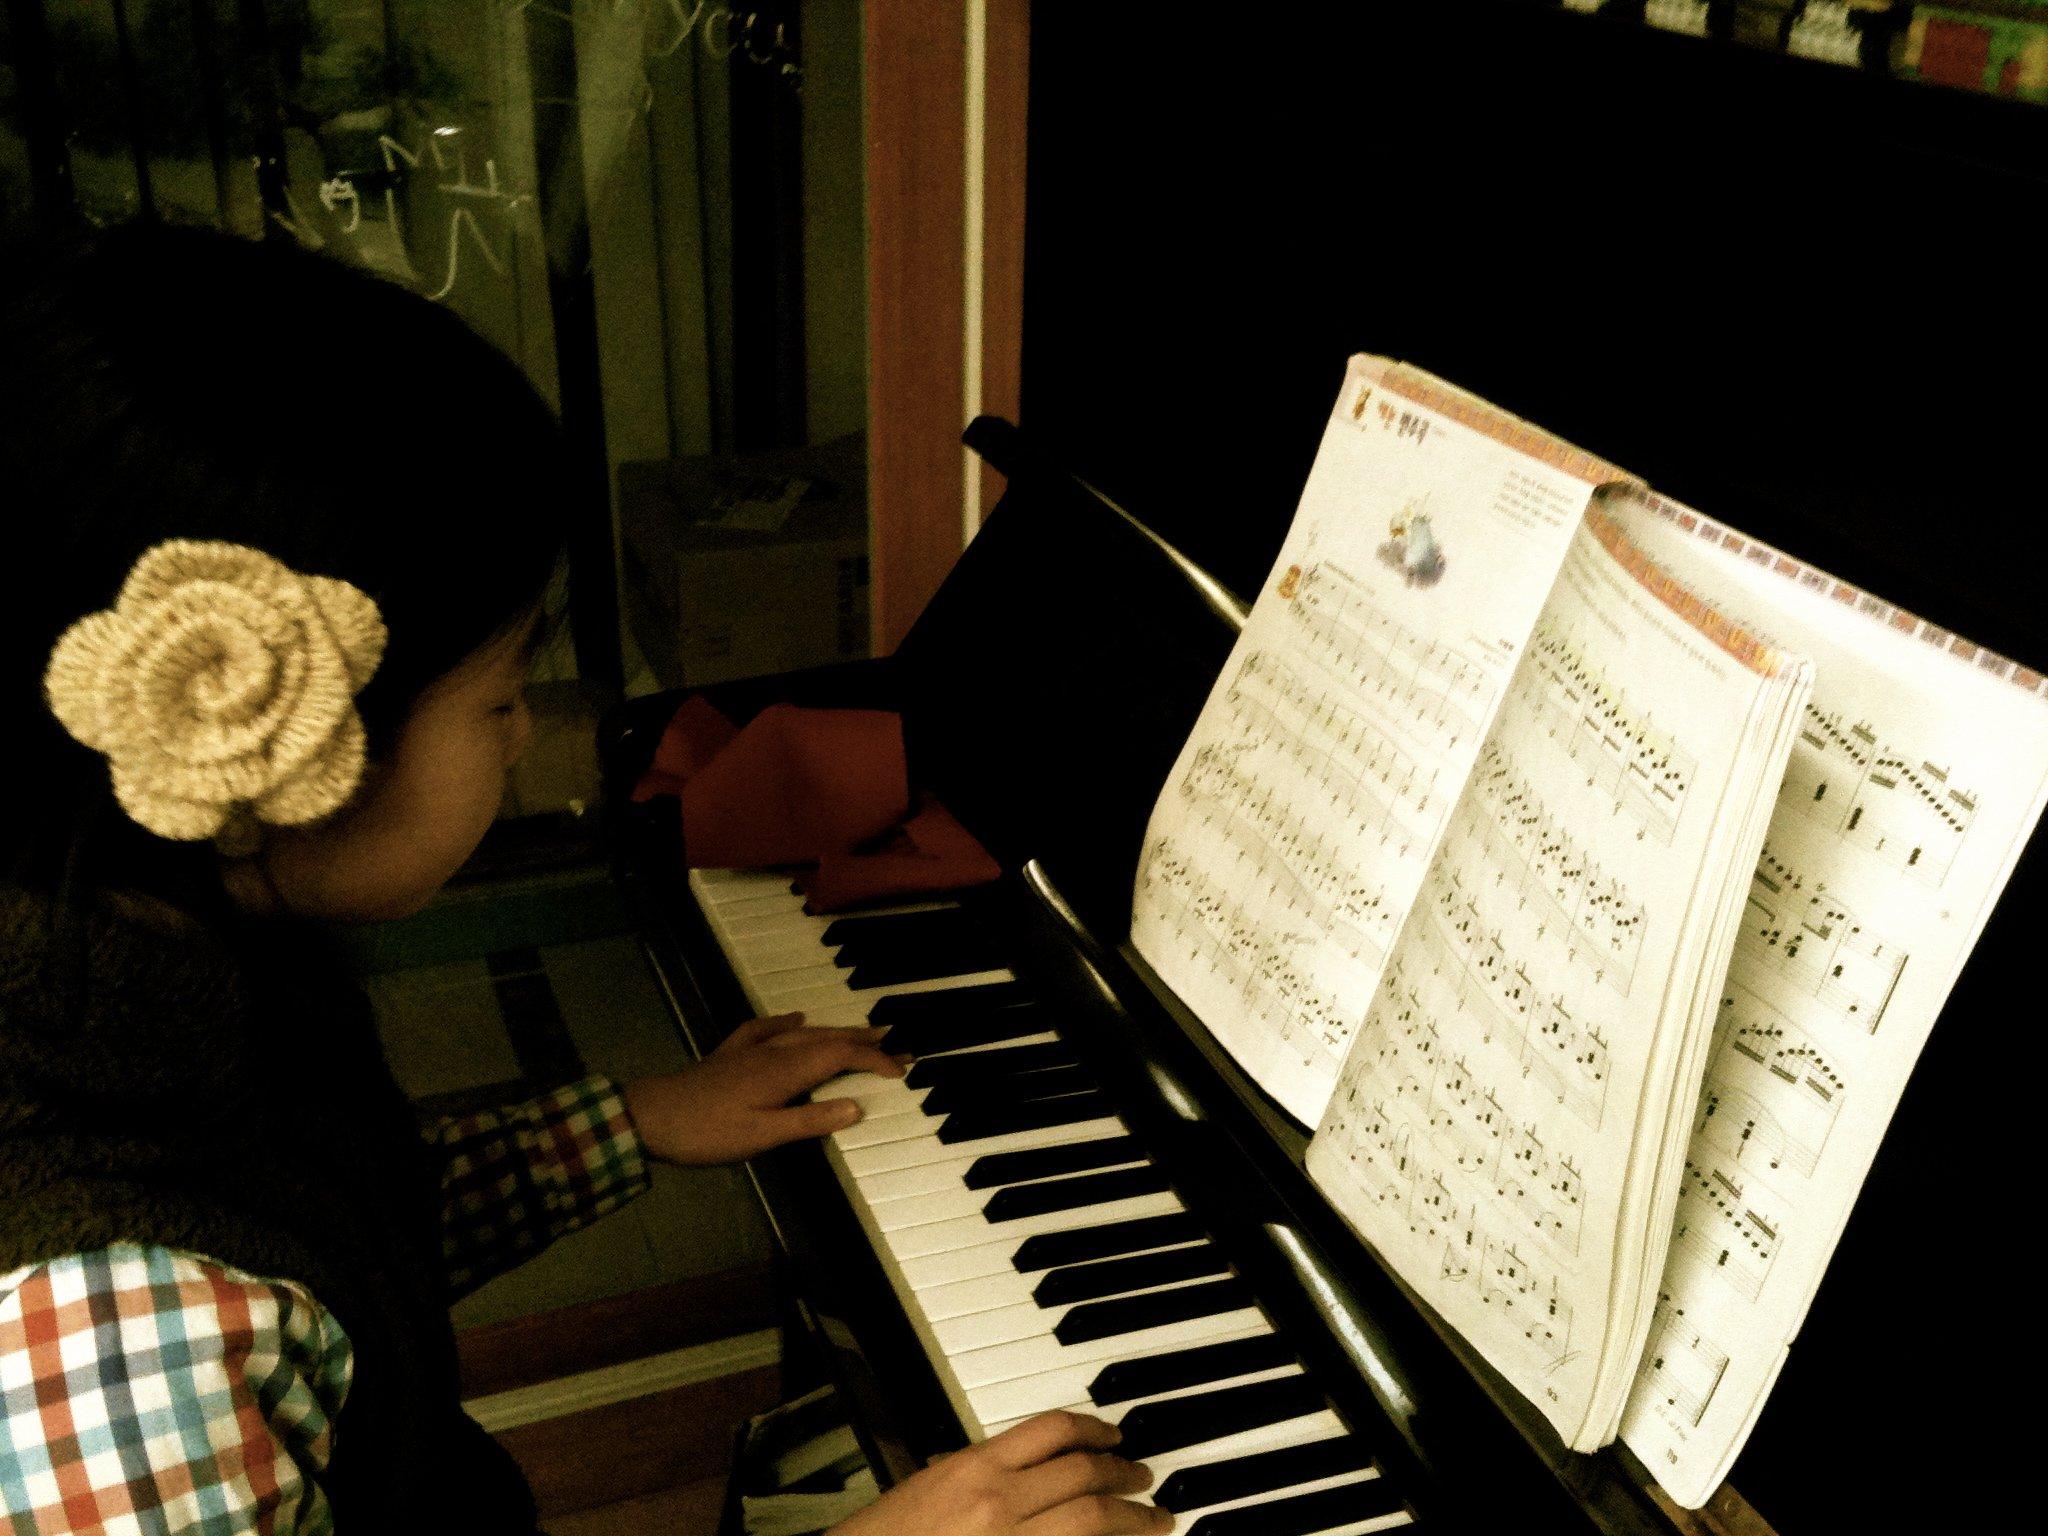 Korean student playing piano